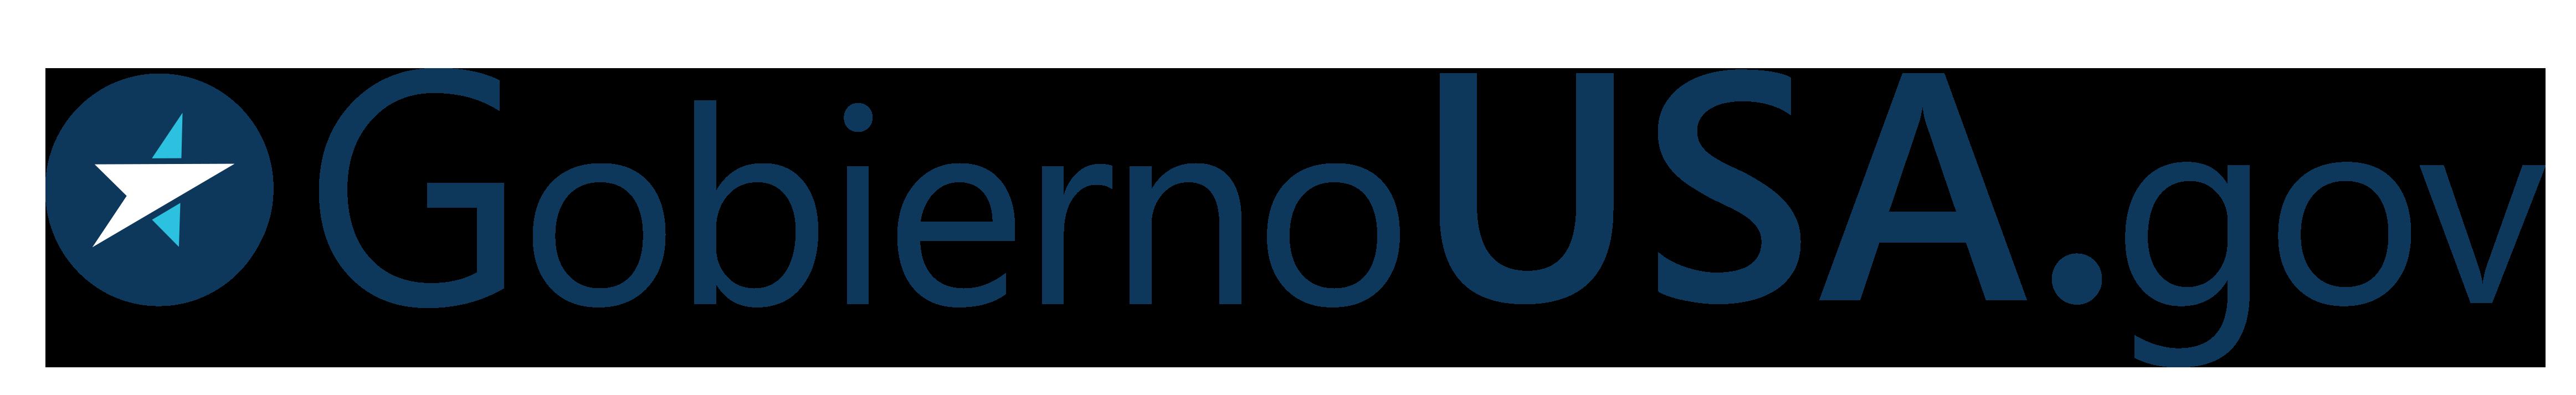 File:GobiernoUSA.gov logo as of 2017.png - Wikimedia Commons